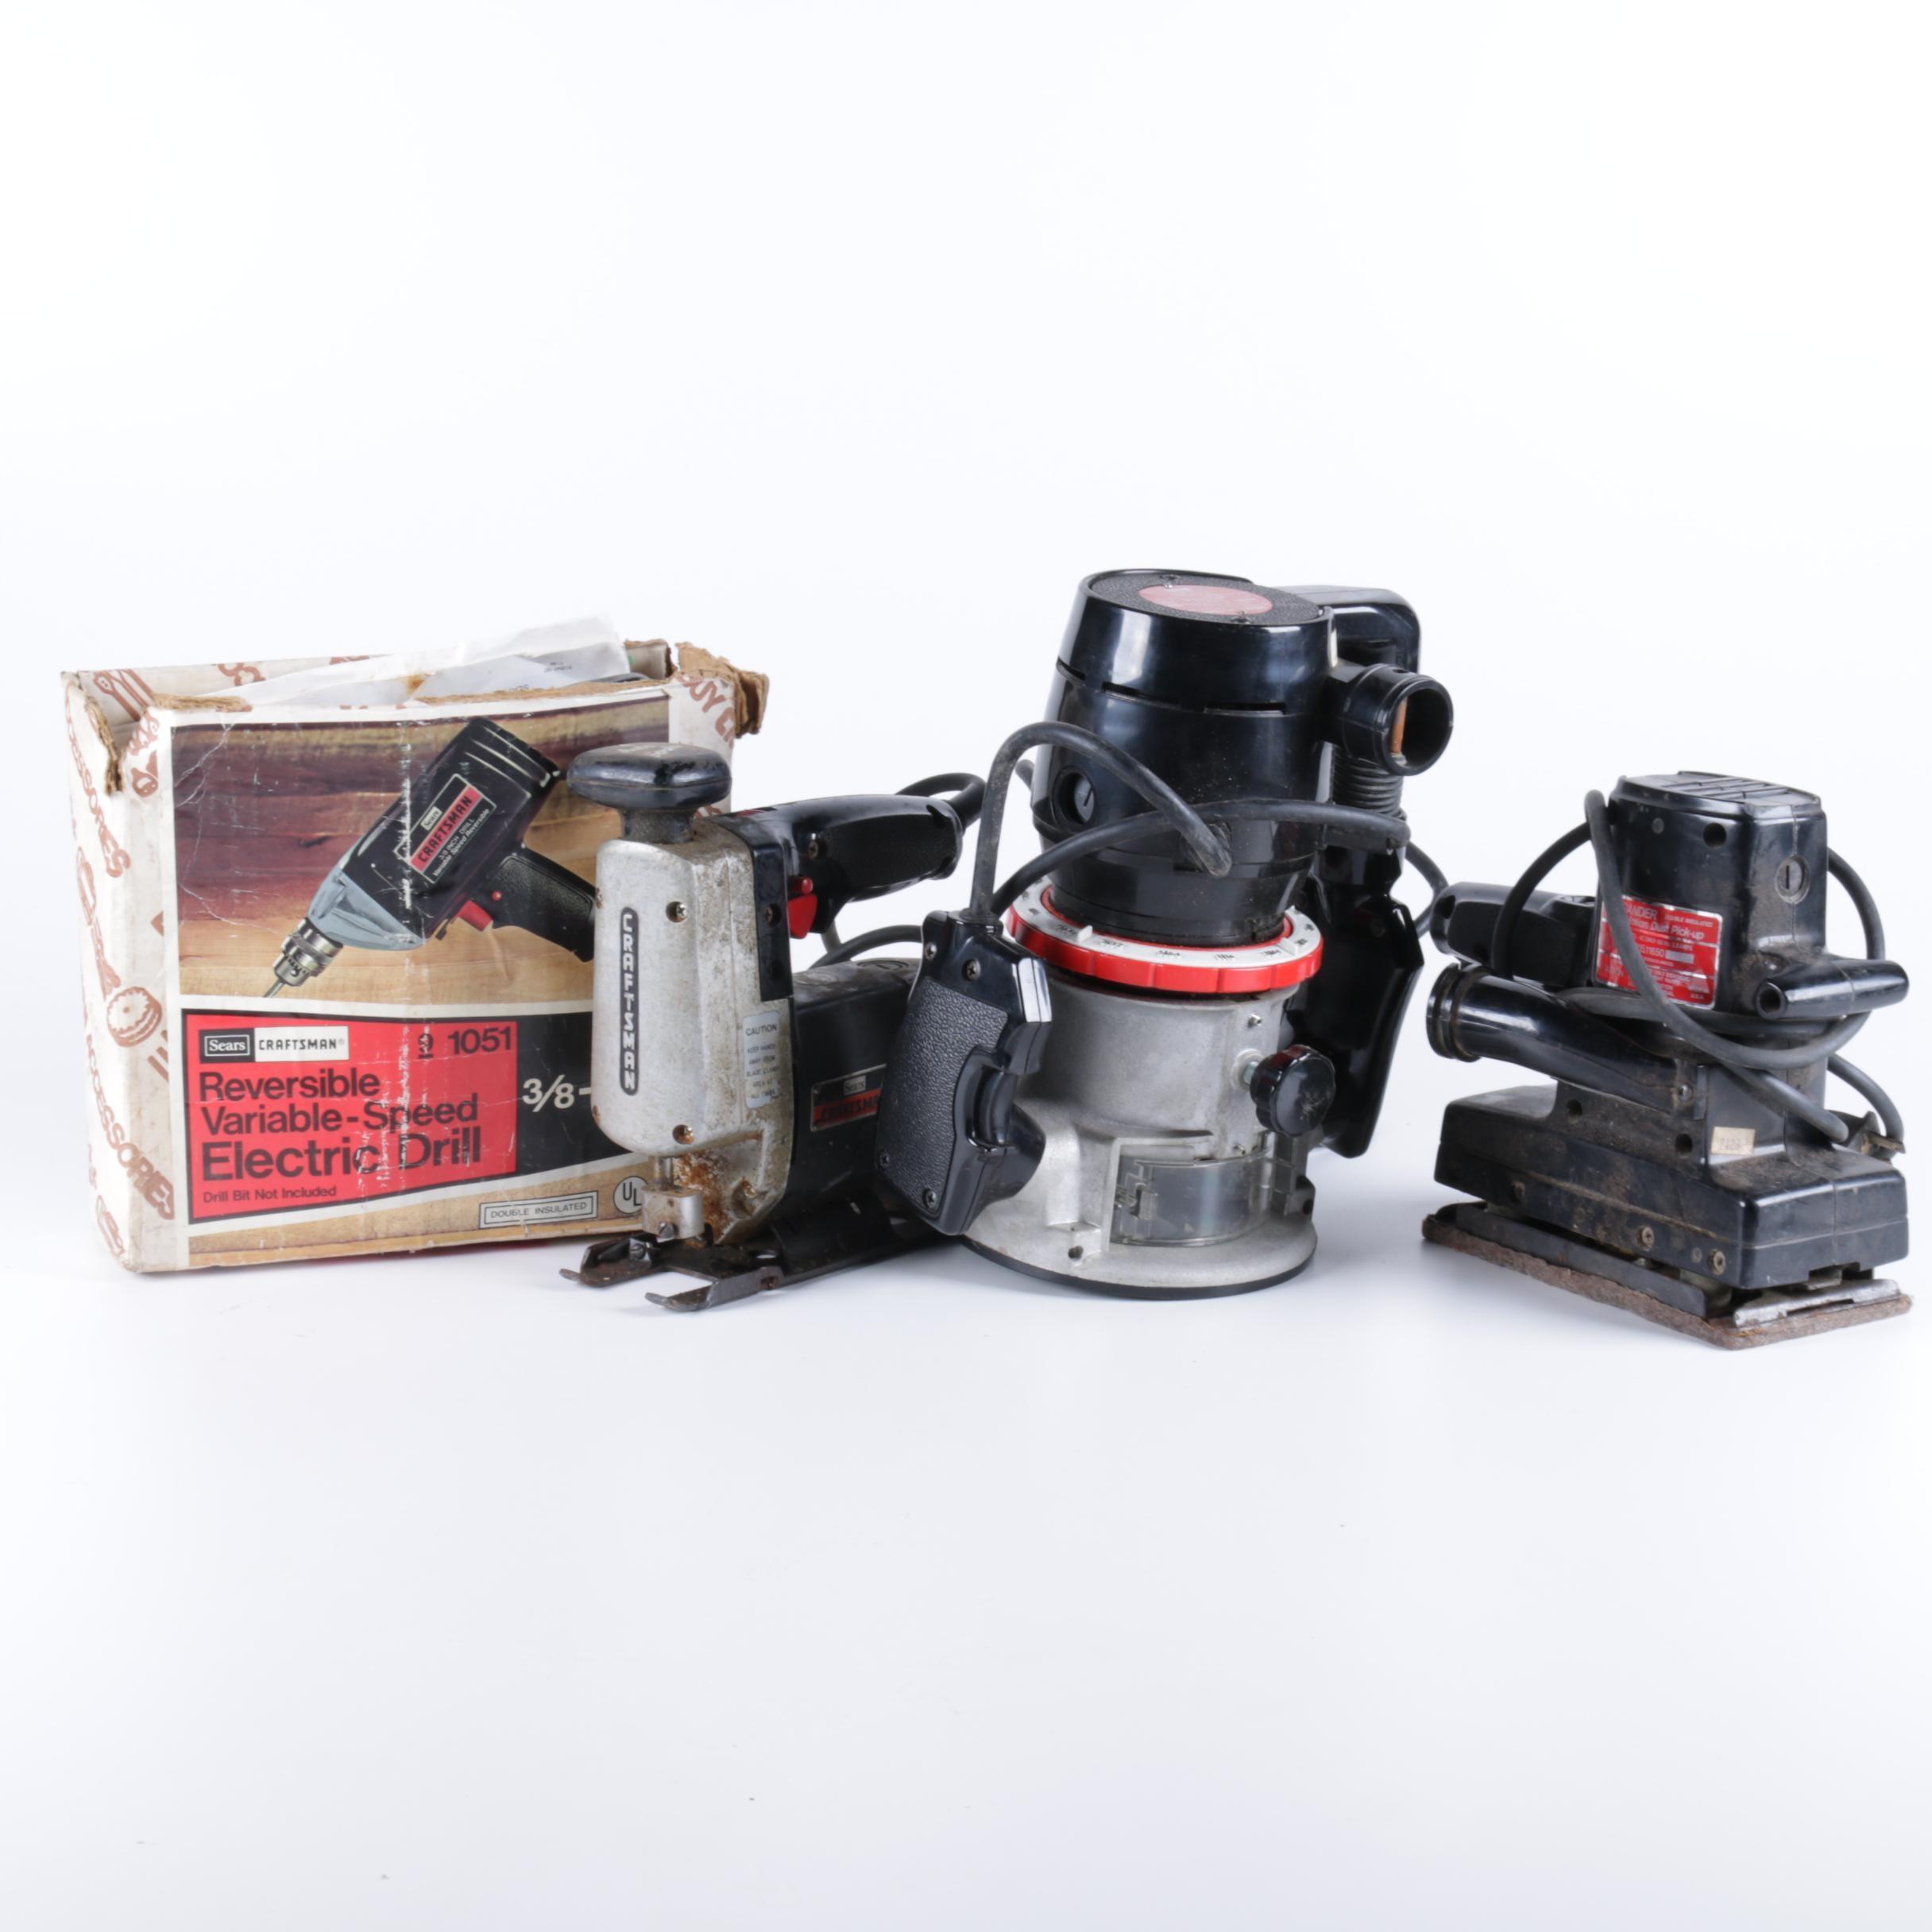 Sears Craftsman Power Tool Assortment